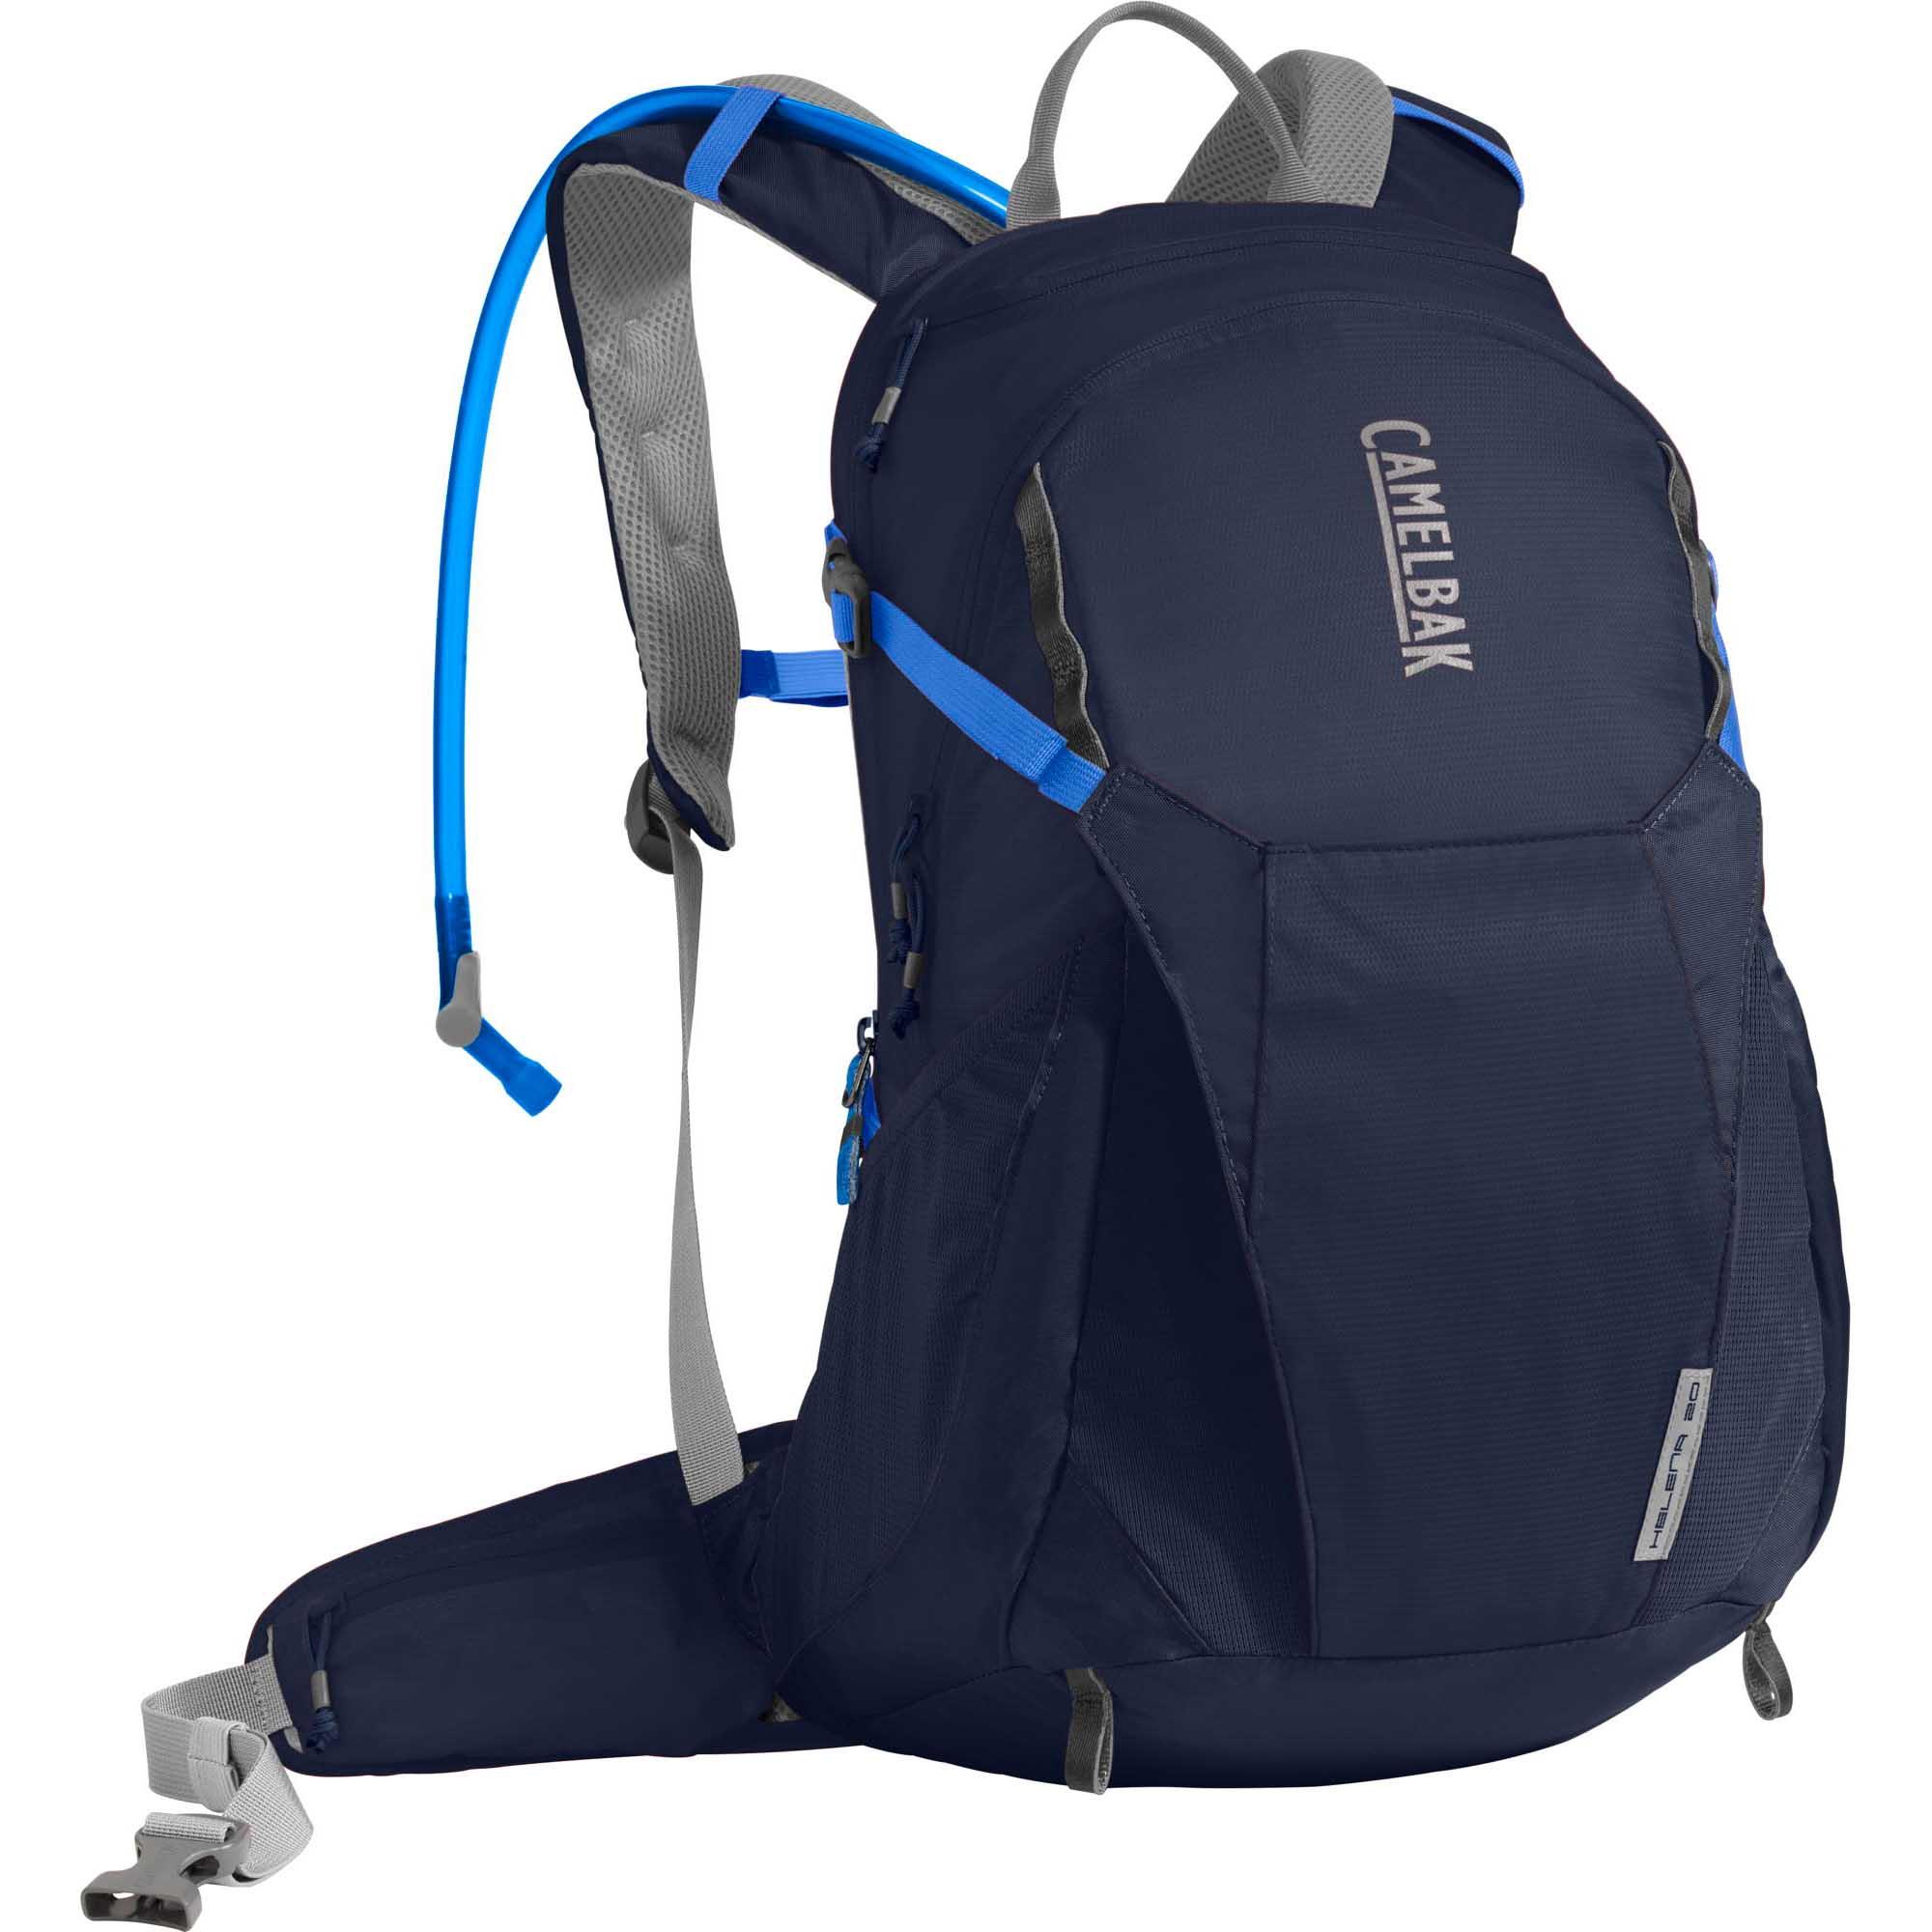 Camelbak Helena 20 Hydration Hiking Backpack